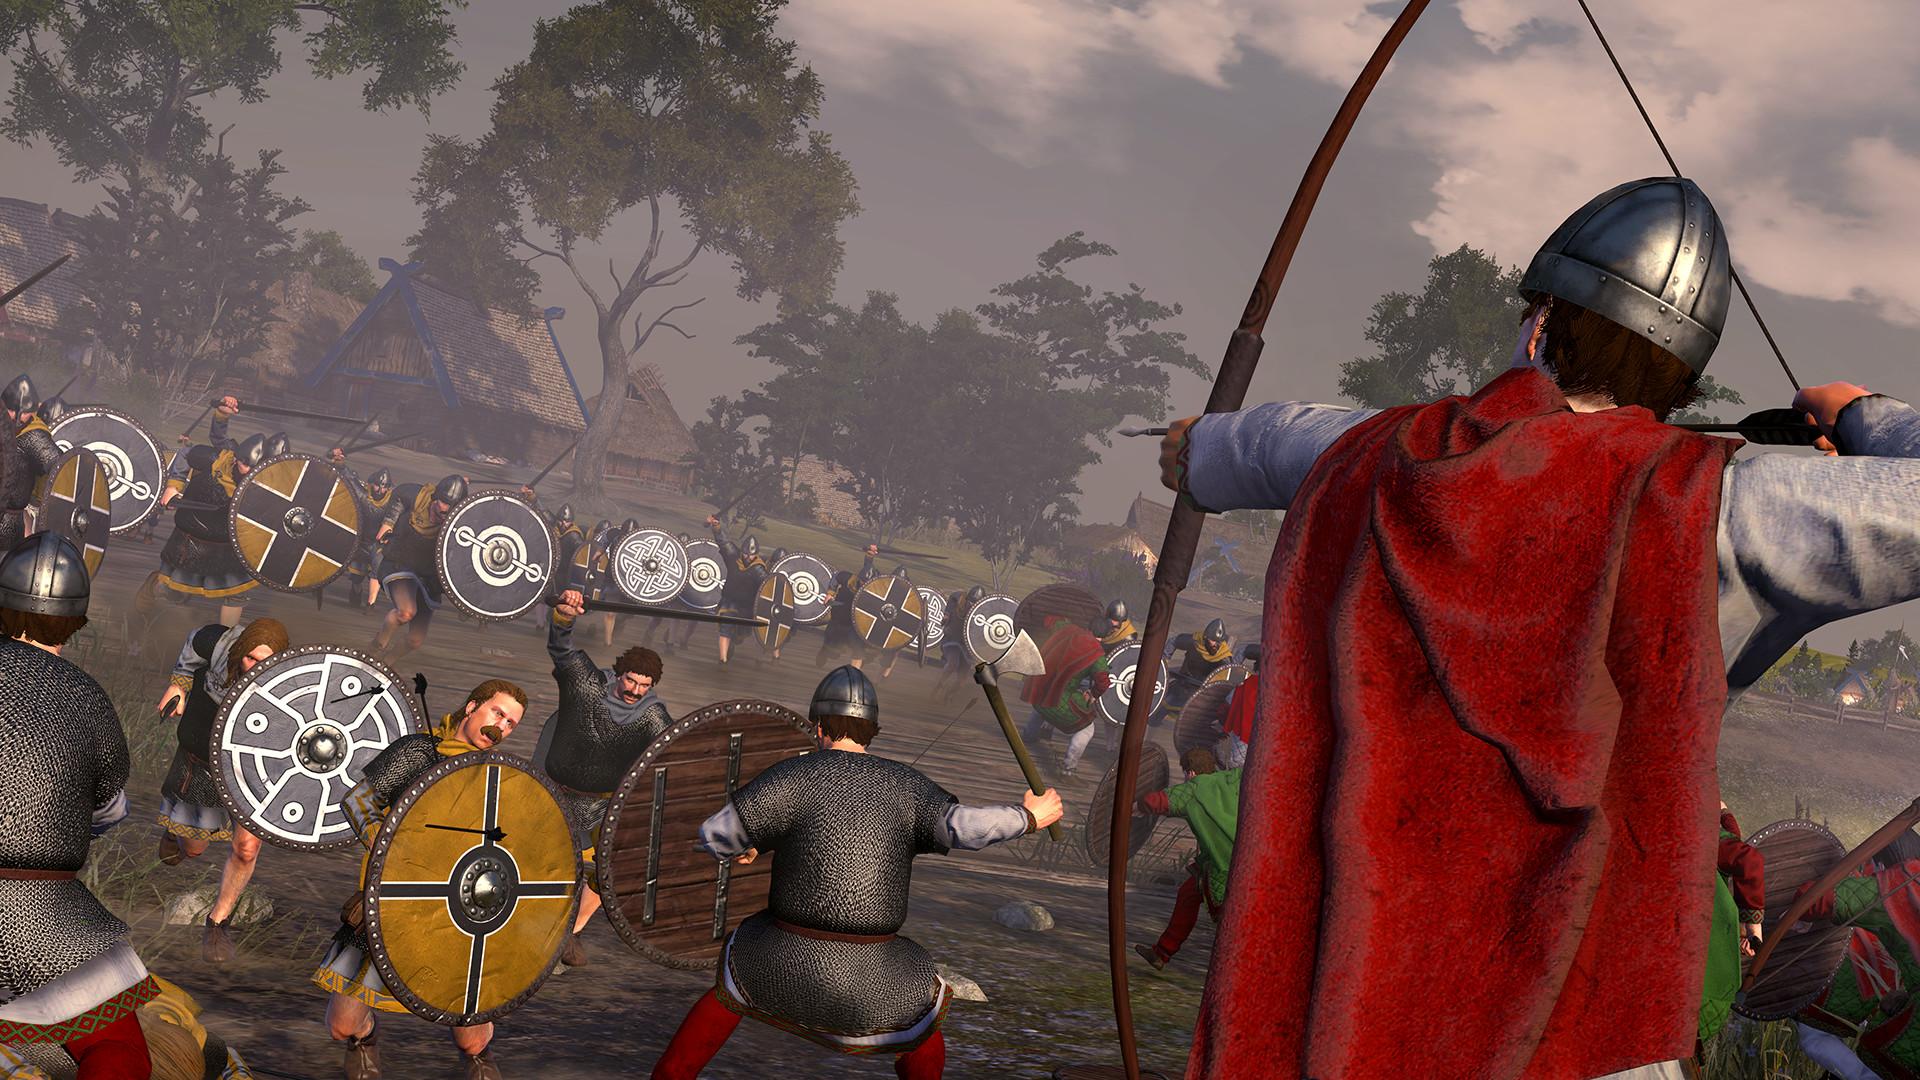 Total War Shogun 2 Fall Of The Samurai Wallpaper Hd The Mixed Total War Game Creative Assembly On Improving